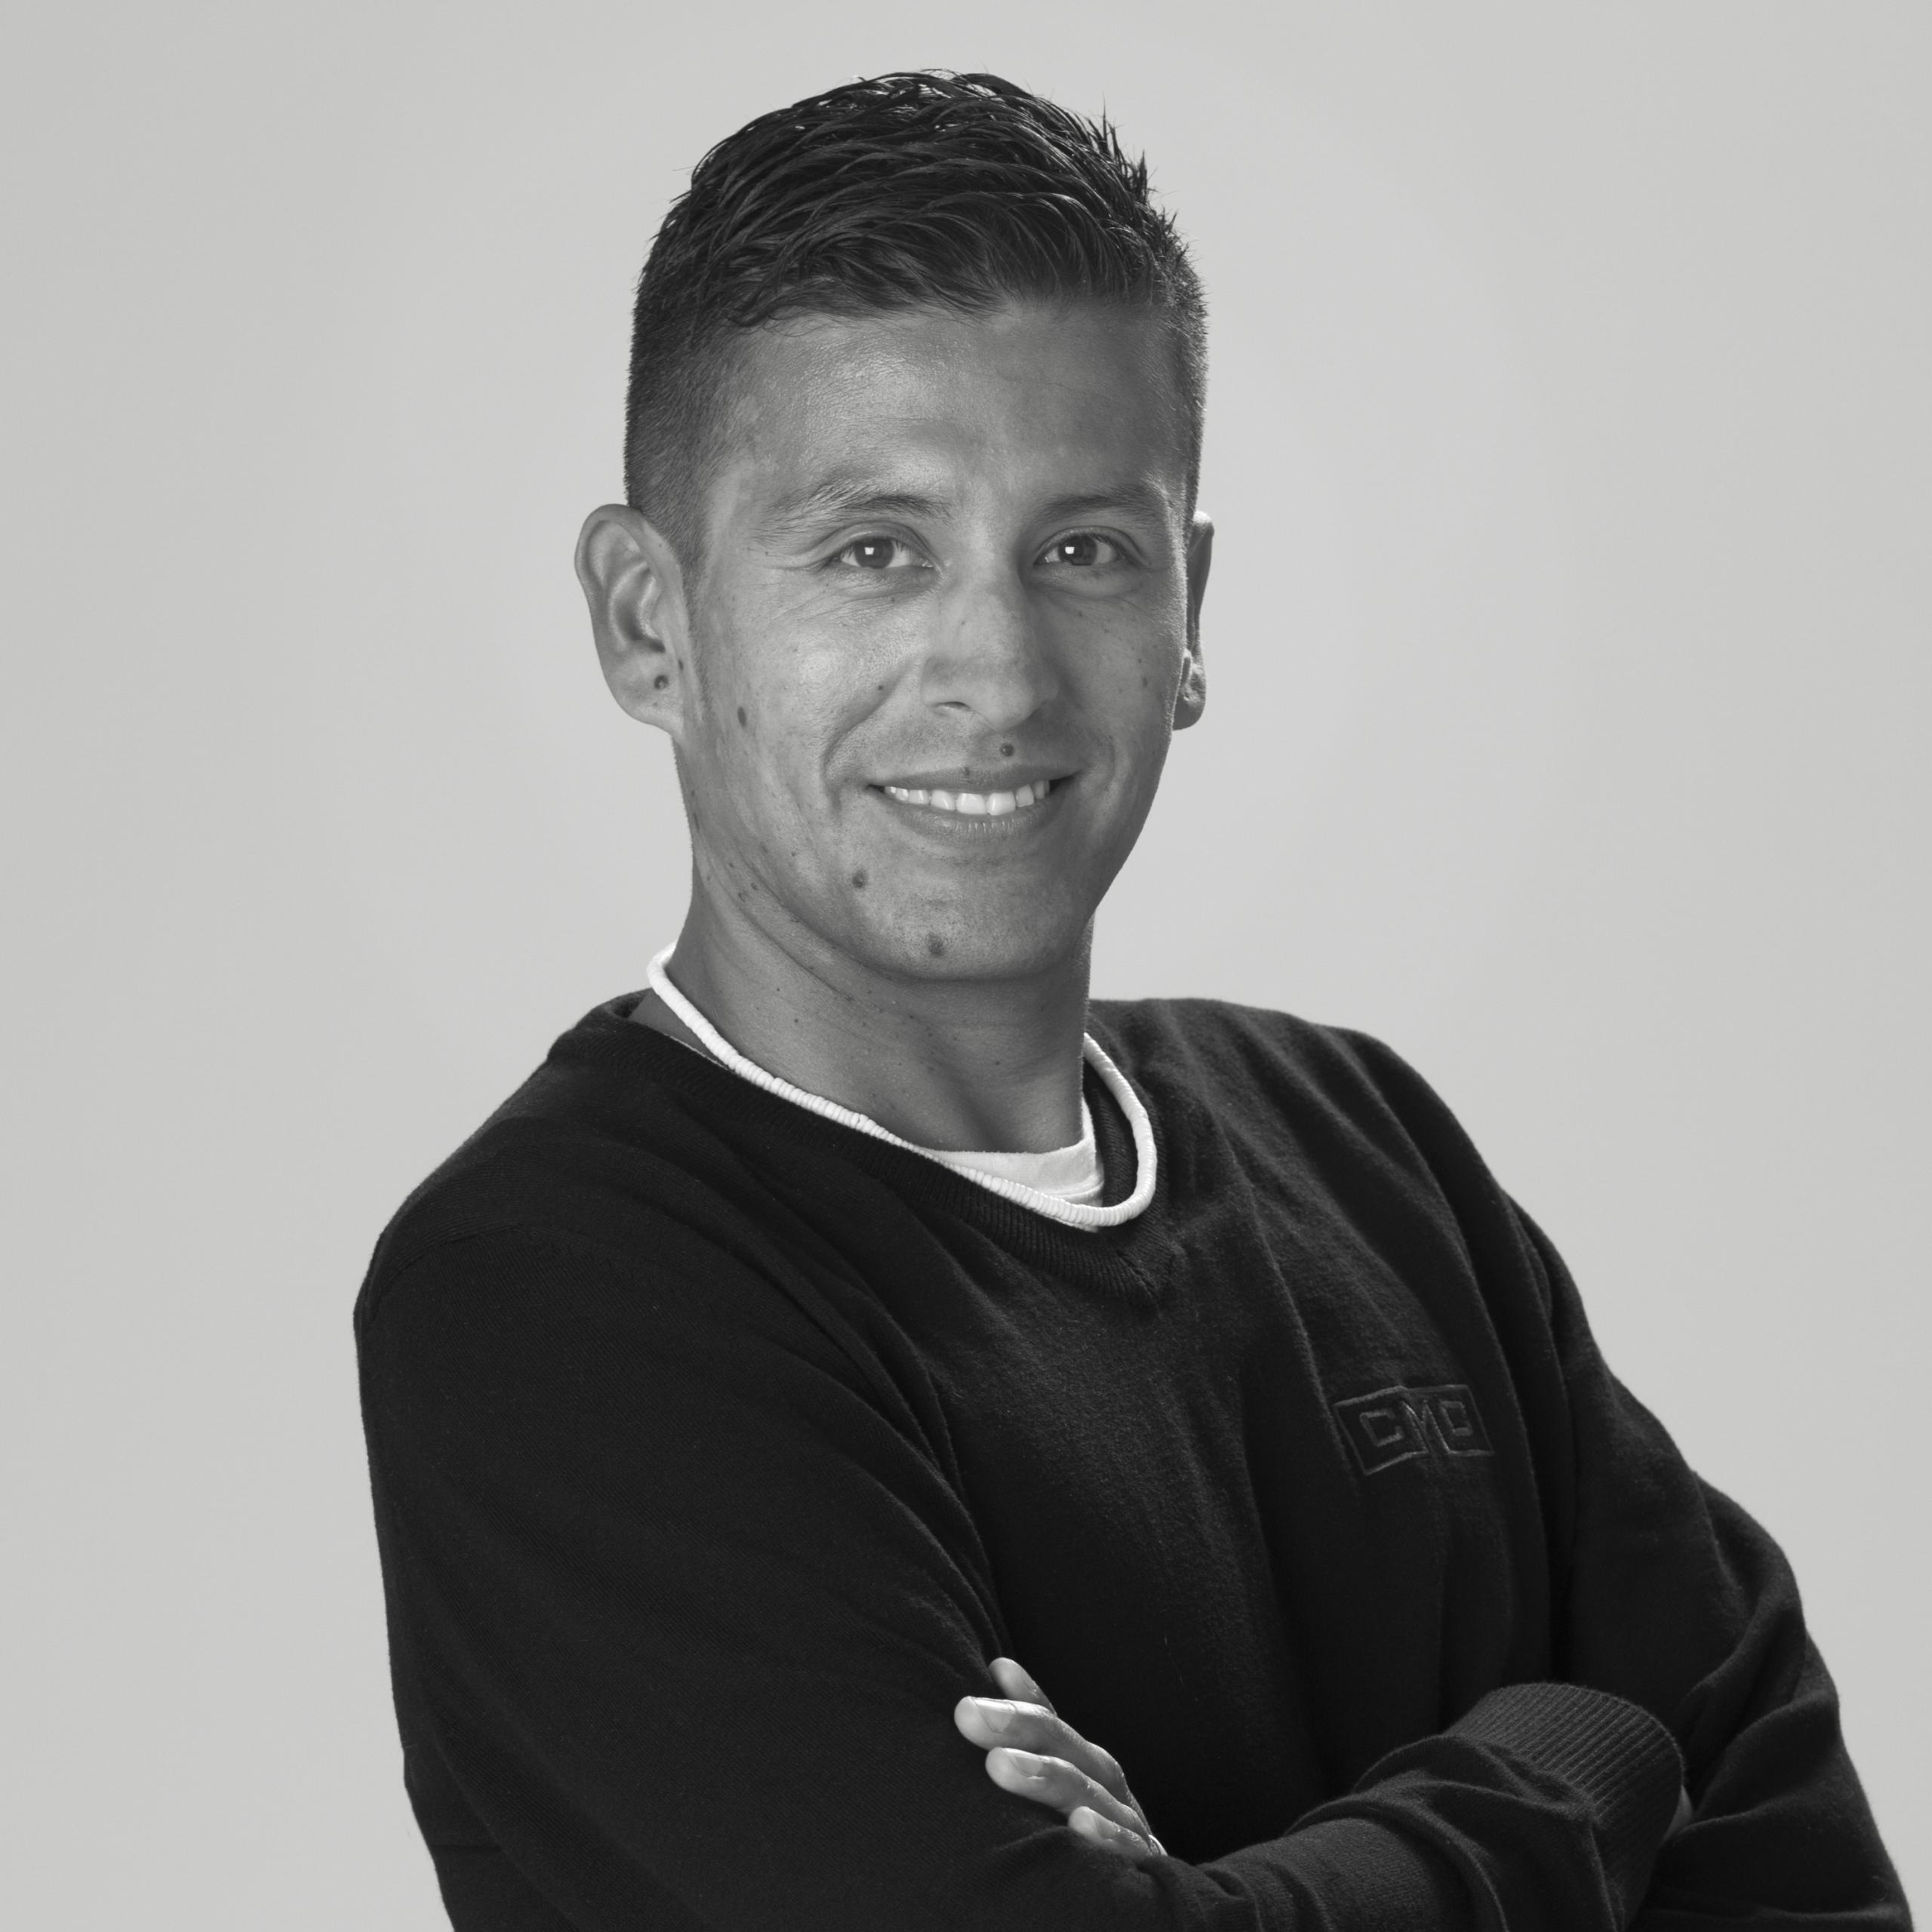 Cristofer Jansson